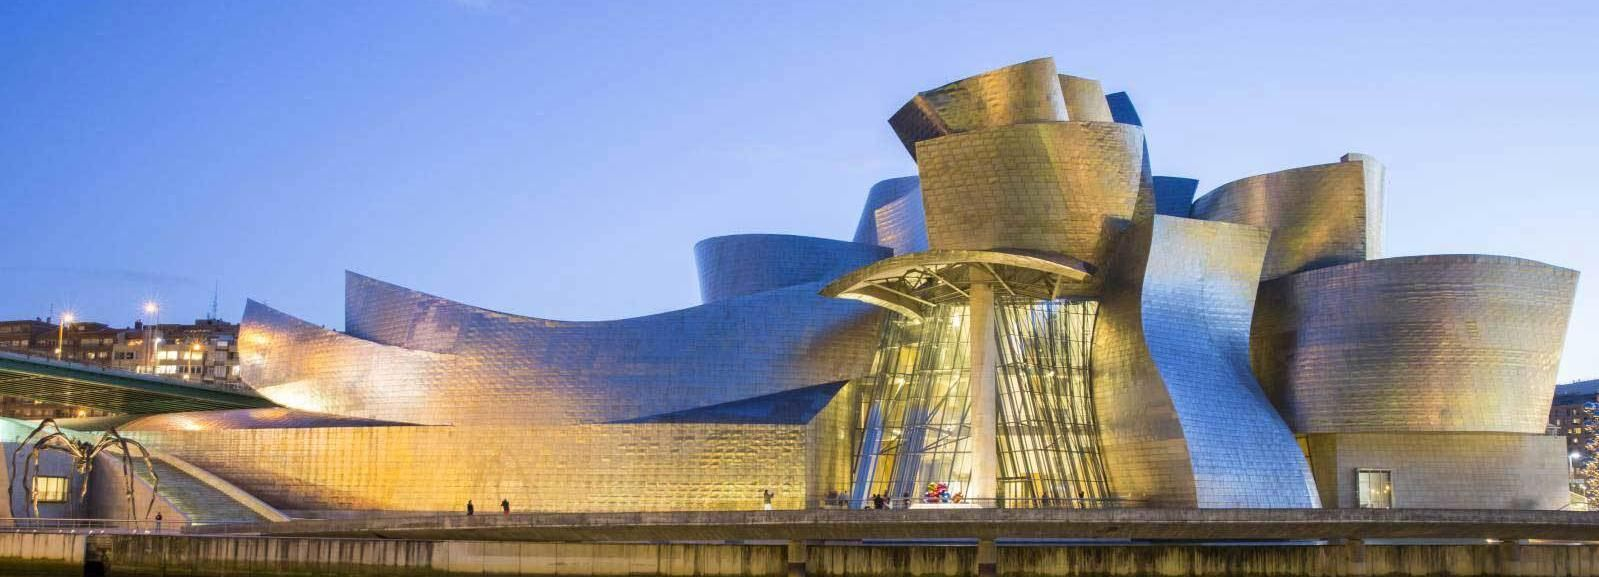 Magia en el museo Guggenheim